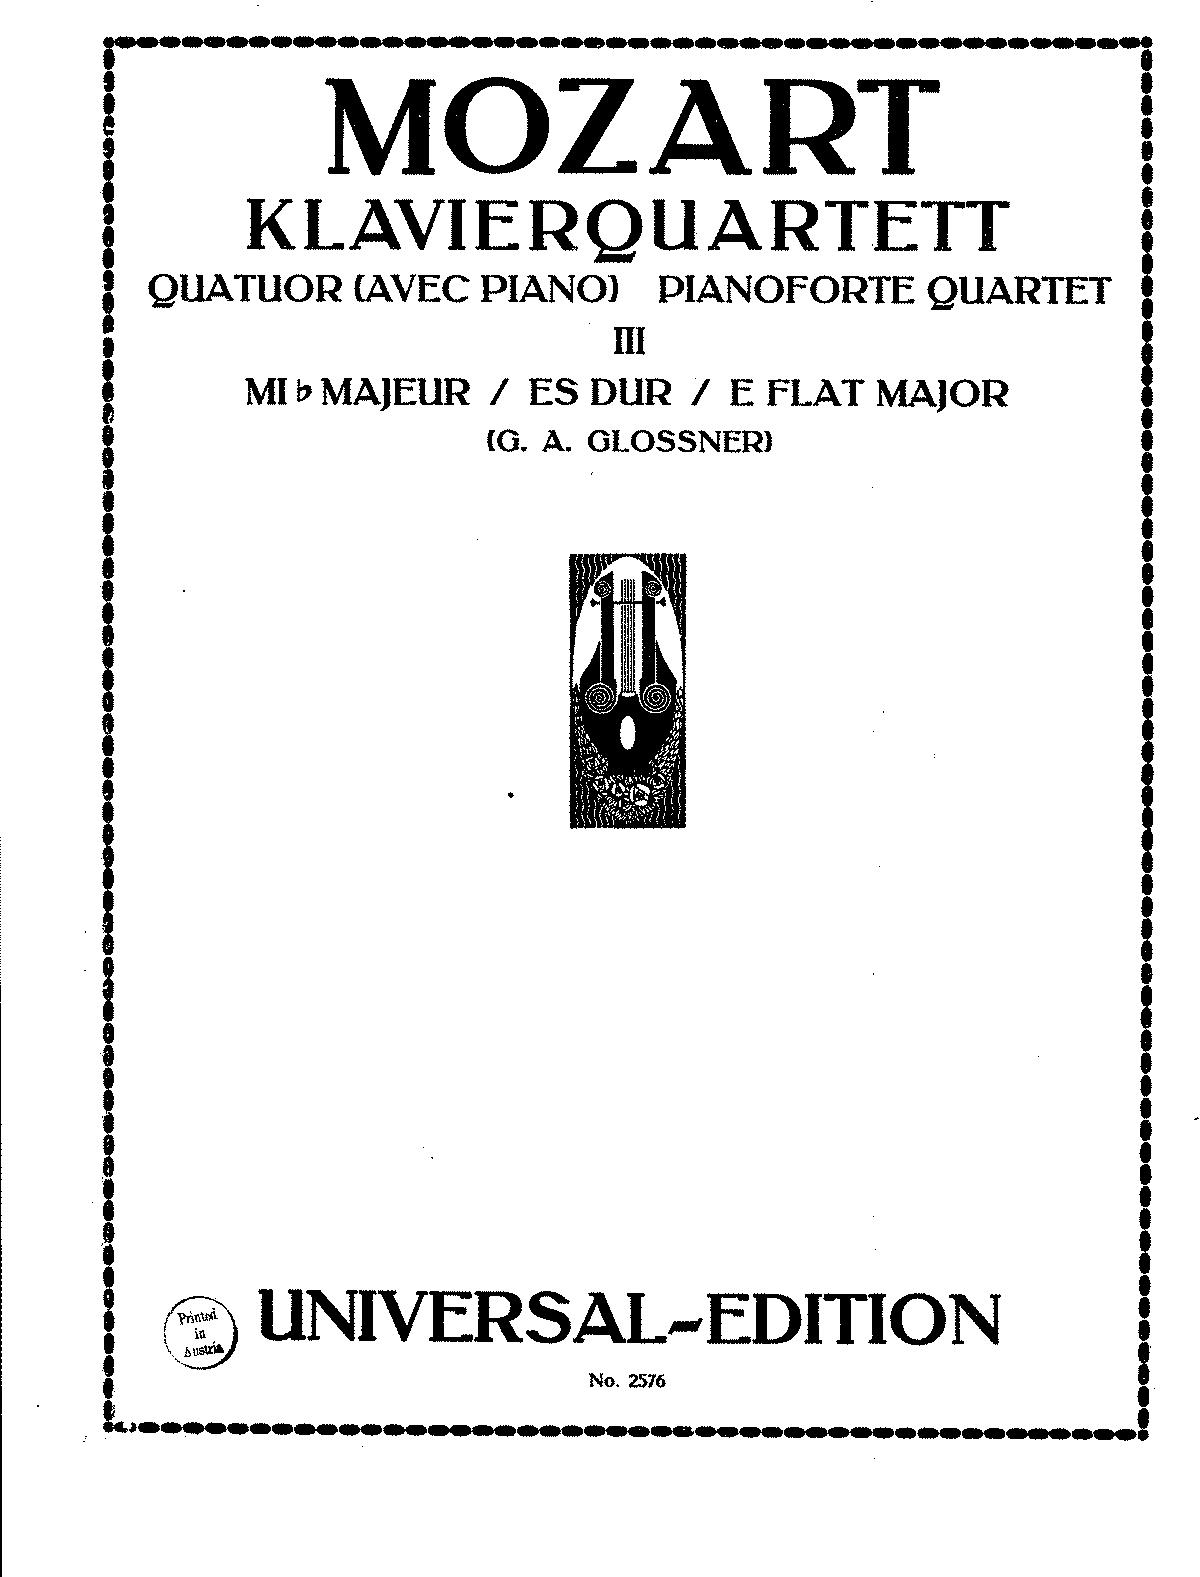 Quintet in E-flat major, K.452 (Mozart, Wolfgang Amadeus